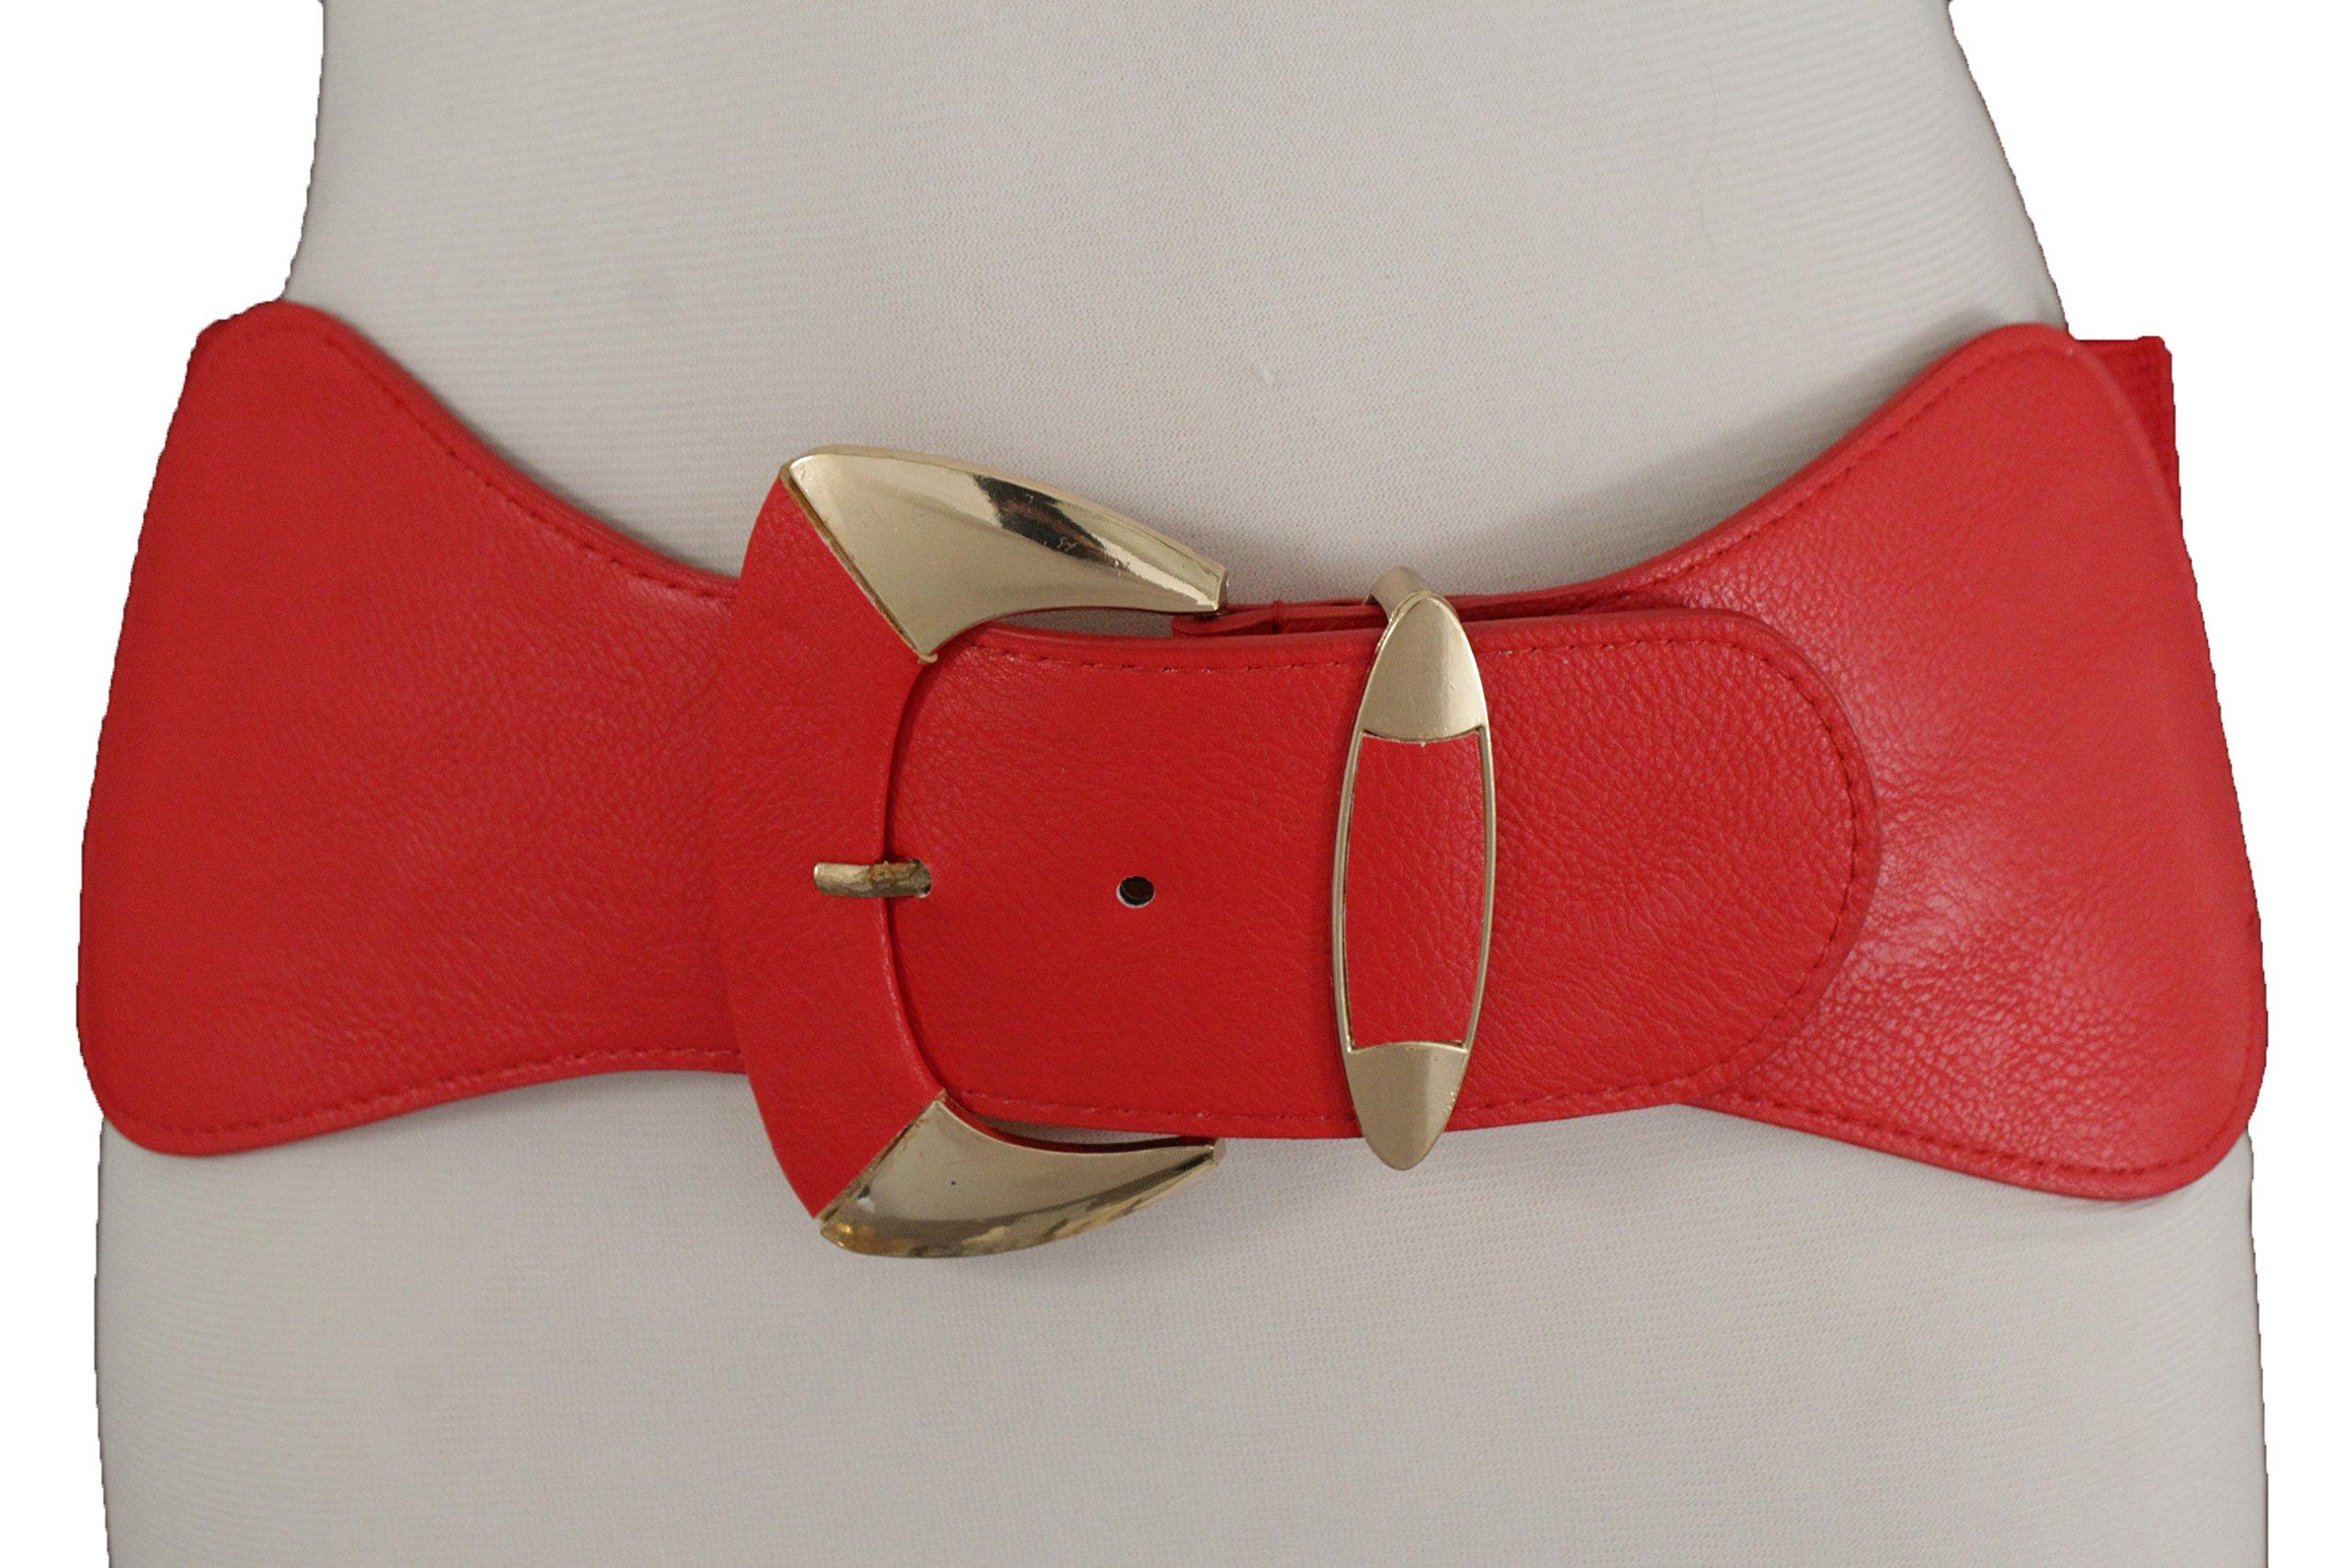 TFJ Women Fashion Wide Belt Elastic Hip High Waist Gold Metal Buckle Fits S M Red